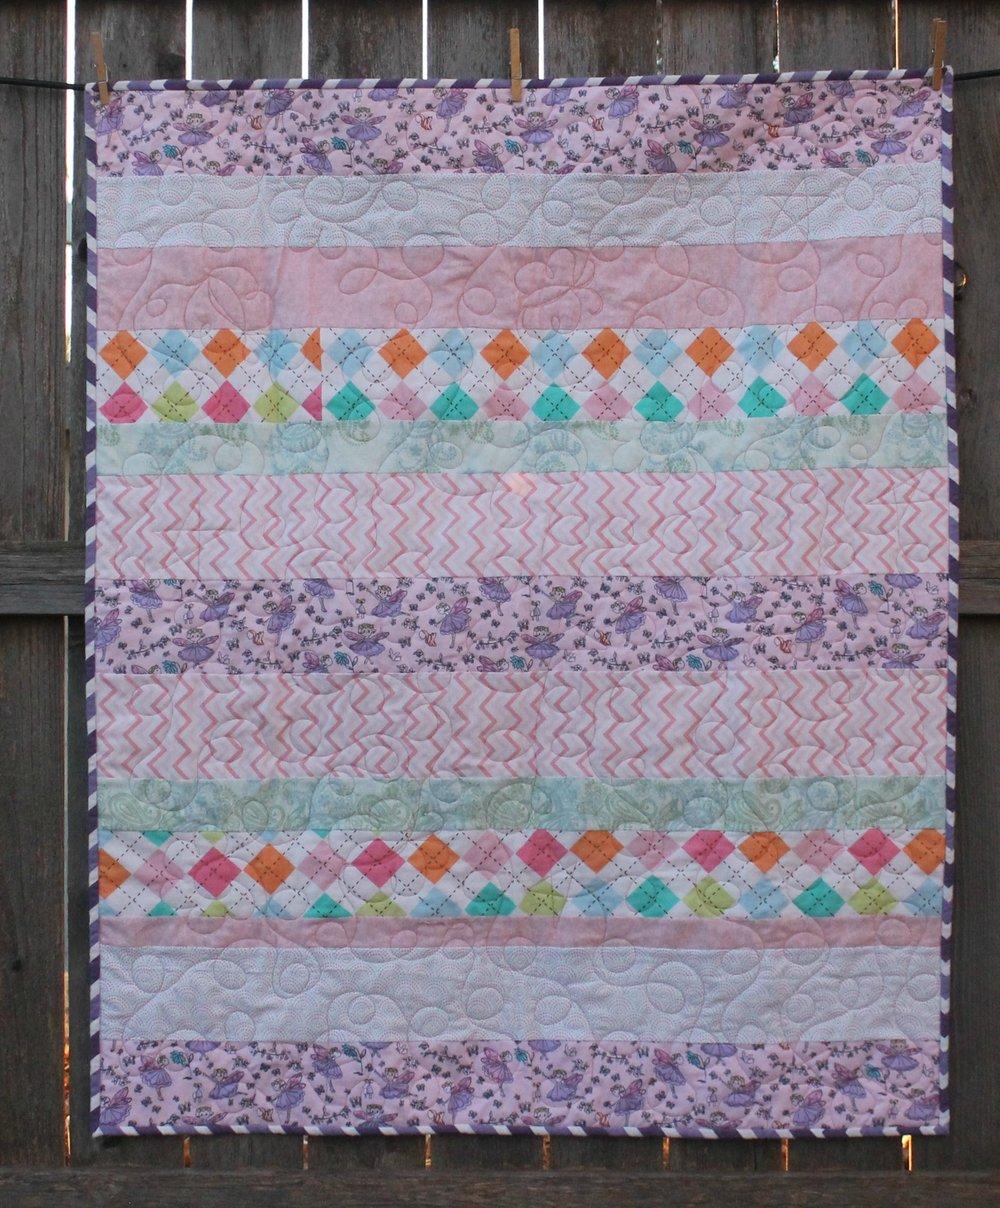 Butterfly_flannel_strip_quilt_1.jpg